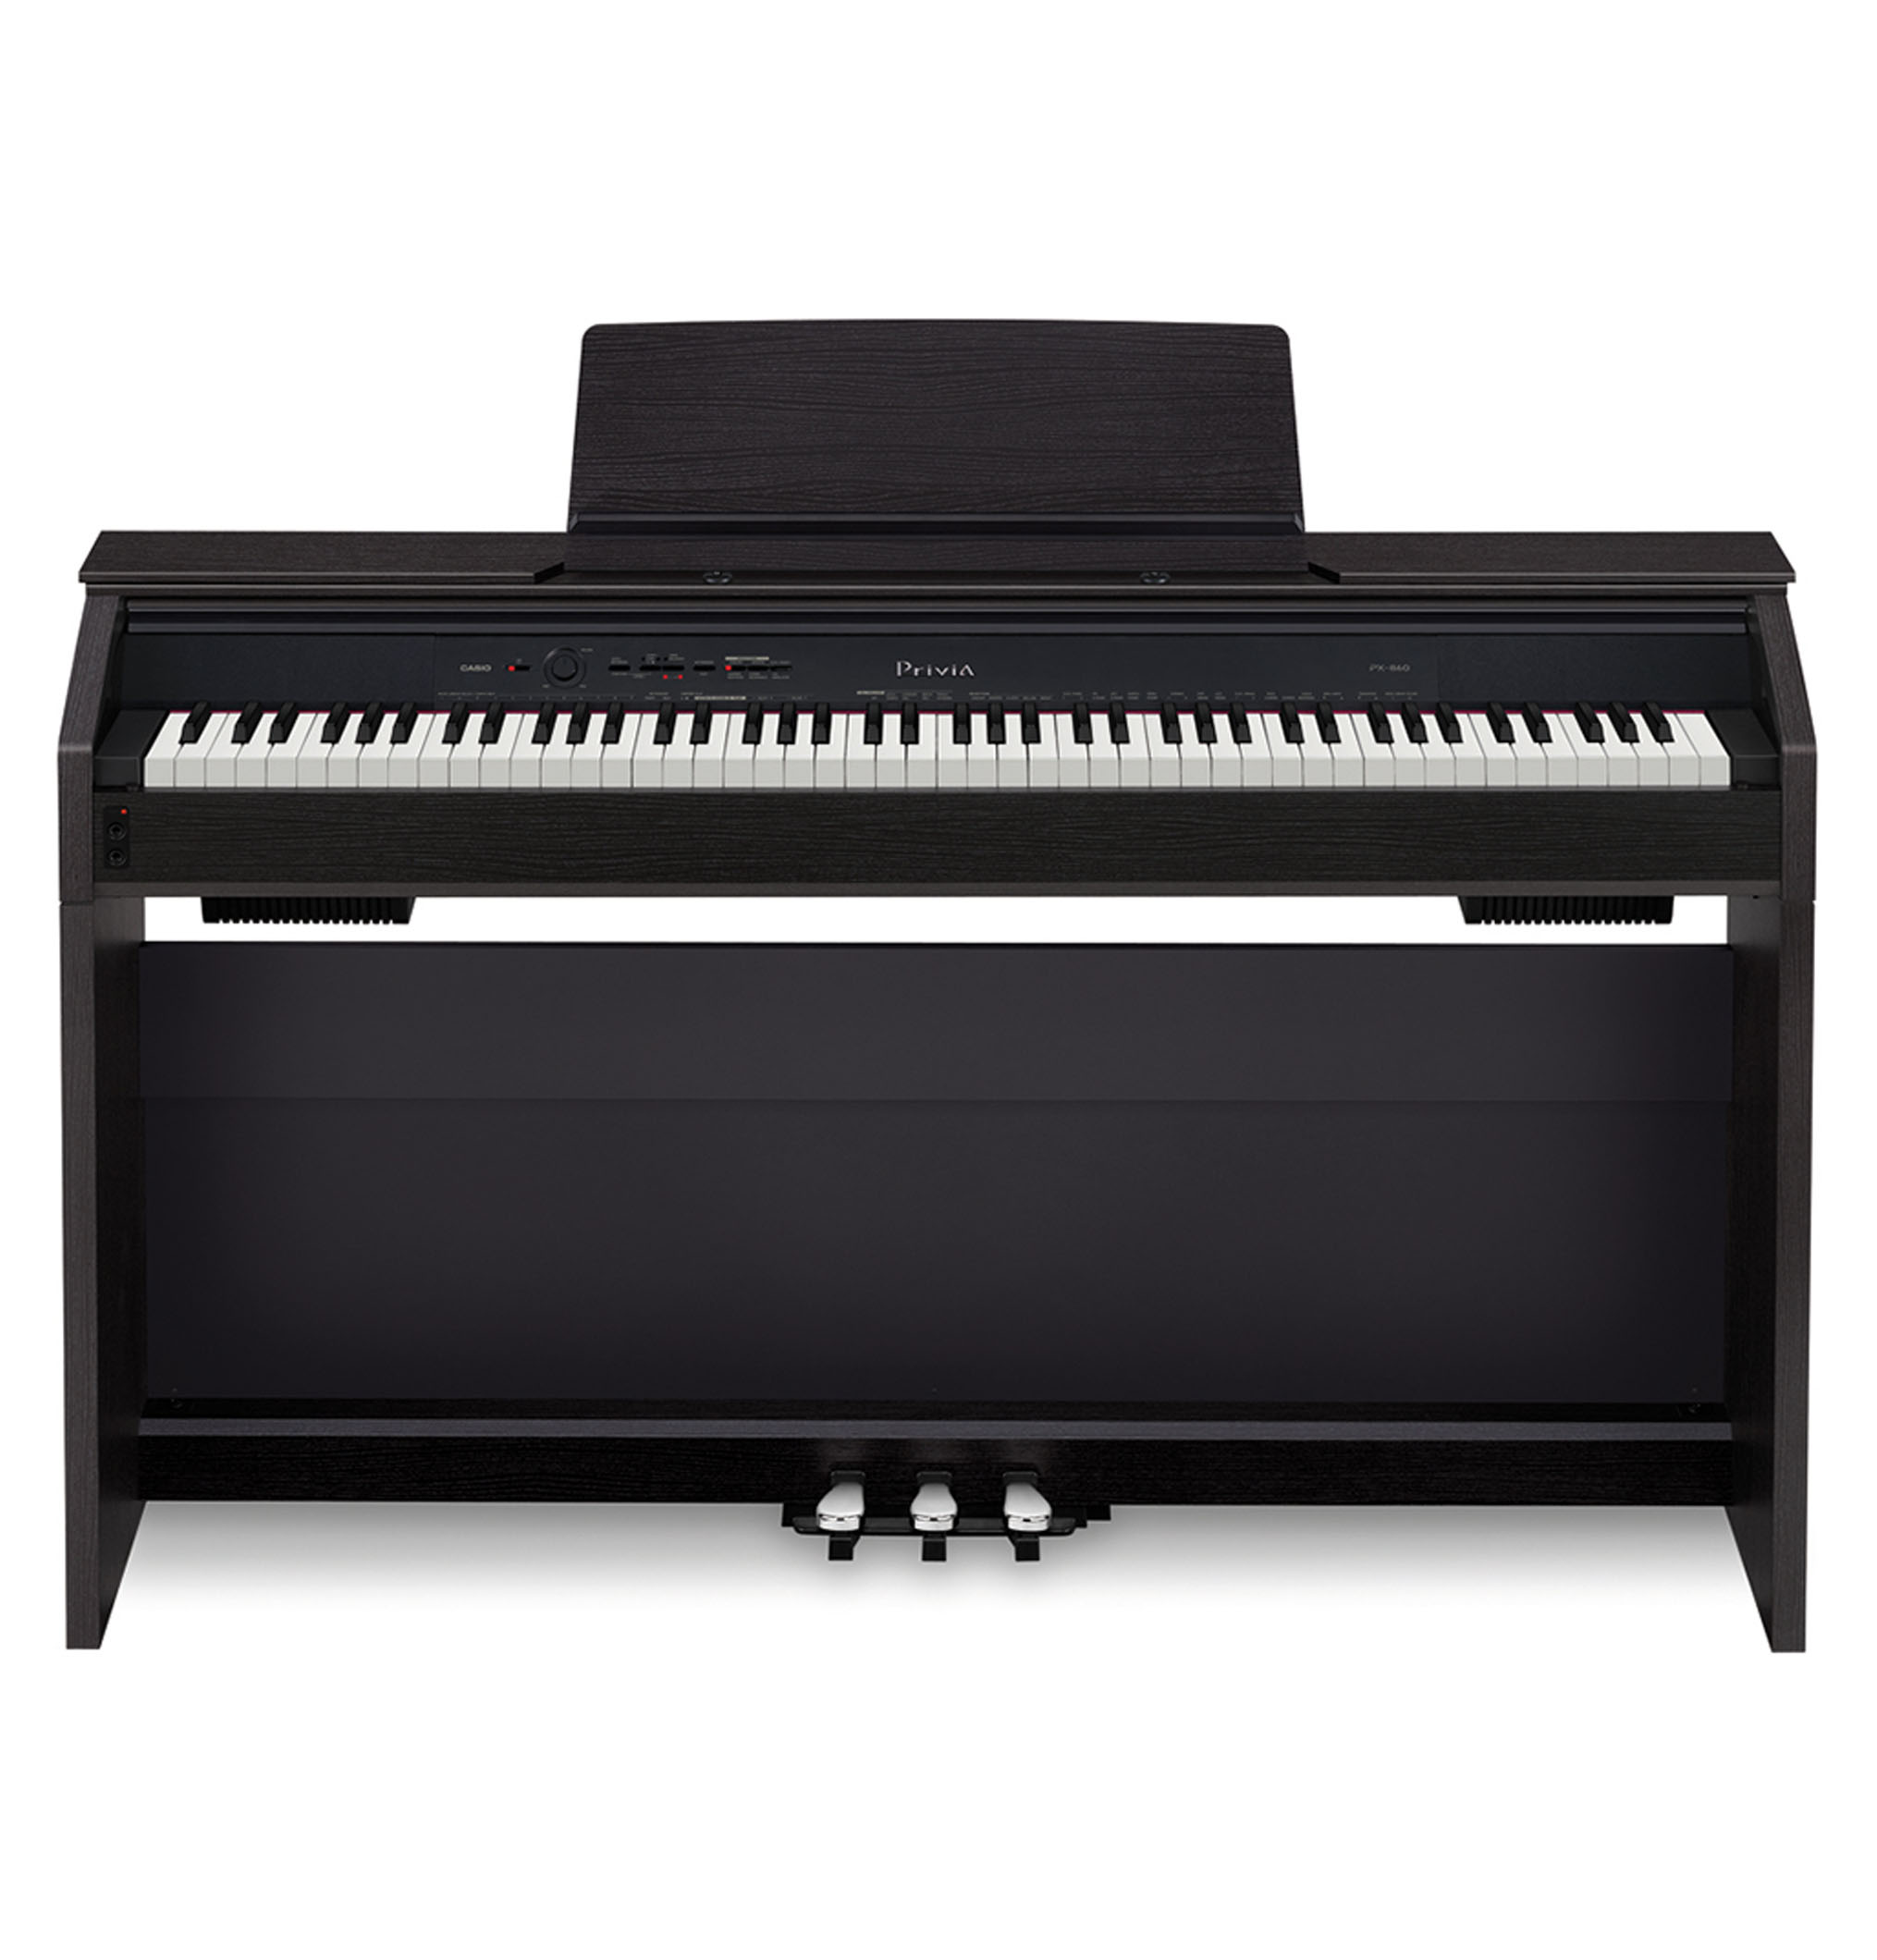 đàn piano casio px-860